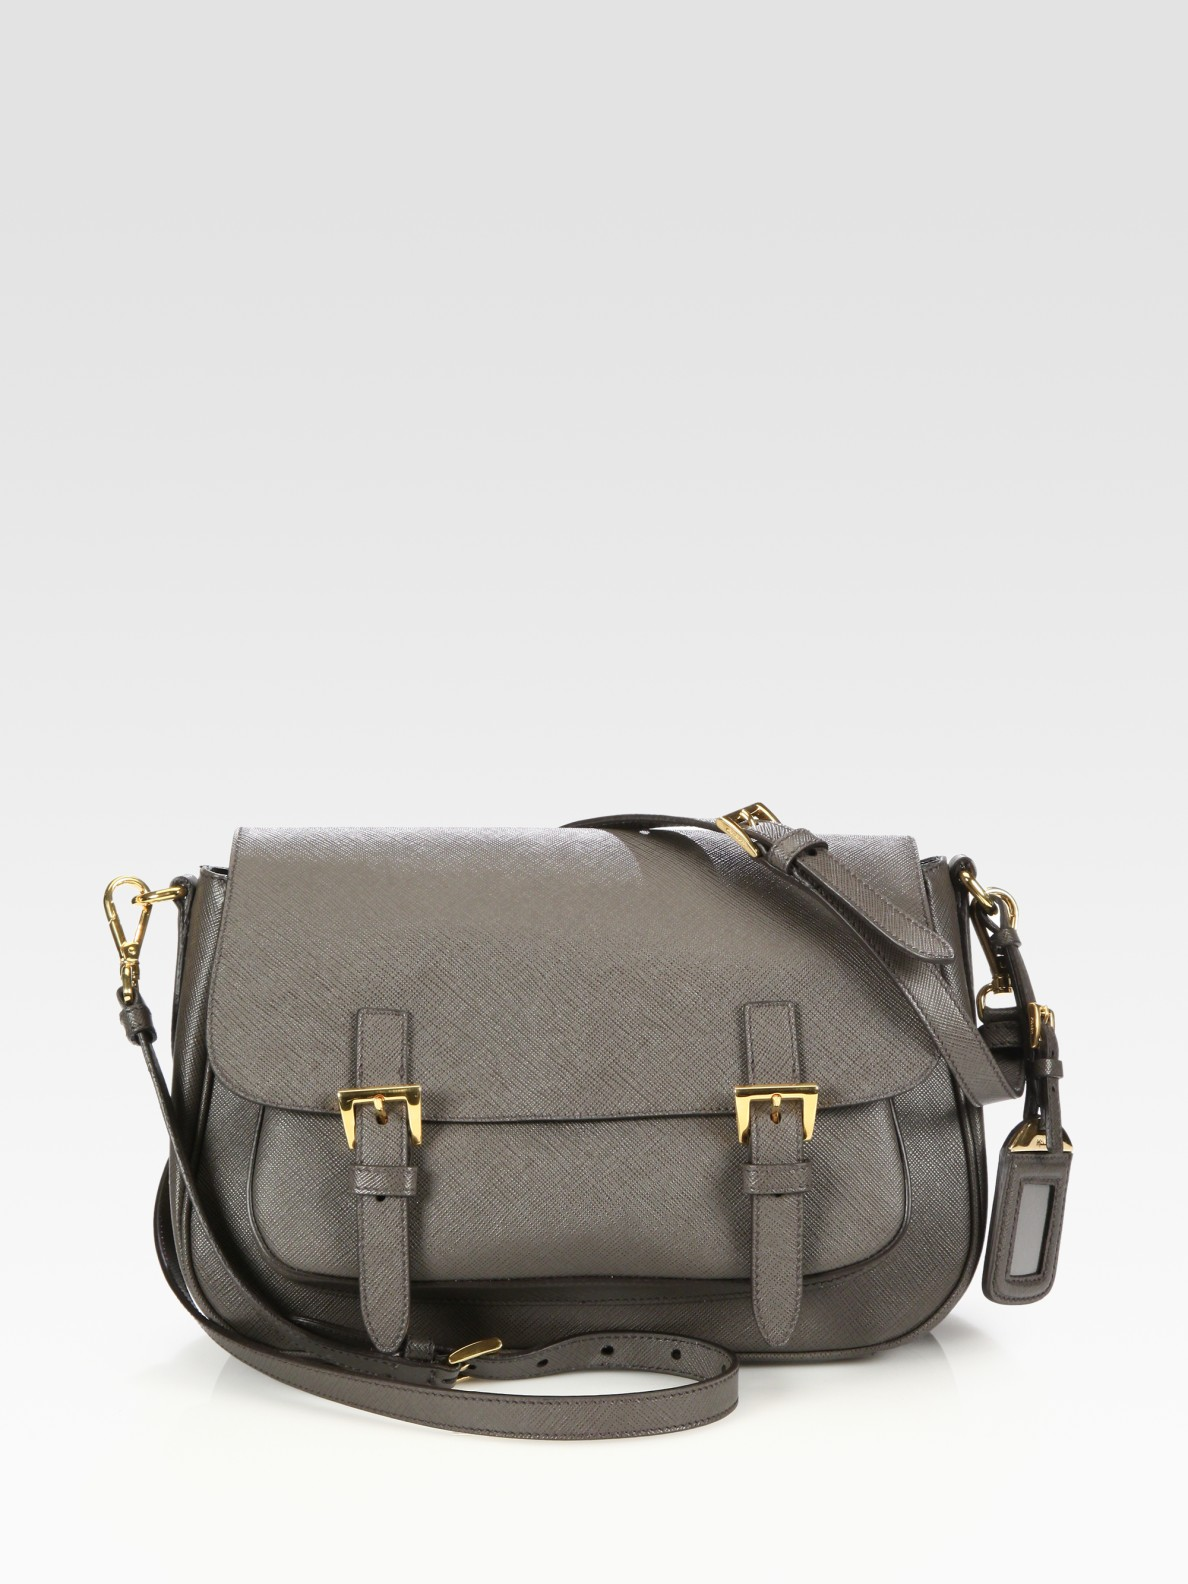 Prada Saffiano Lux Messenger Bag in Gray (grey) | Lyst